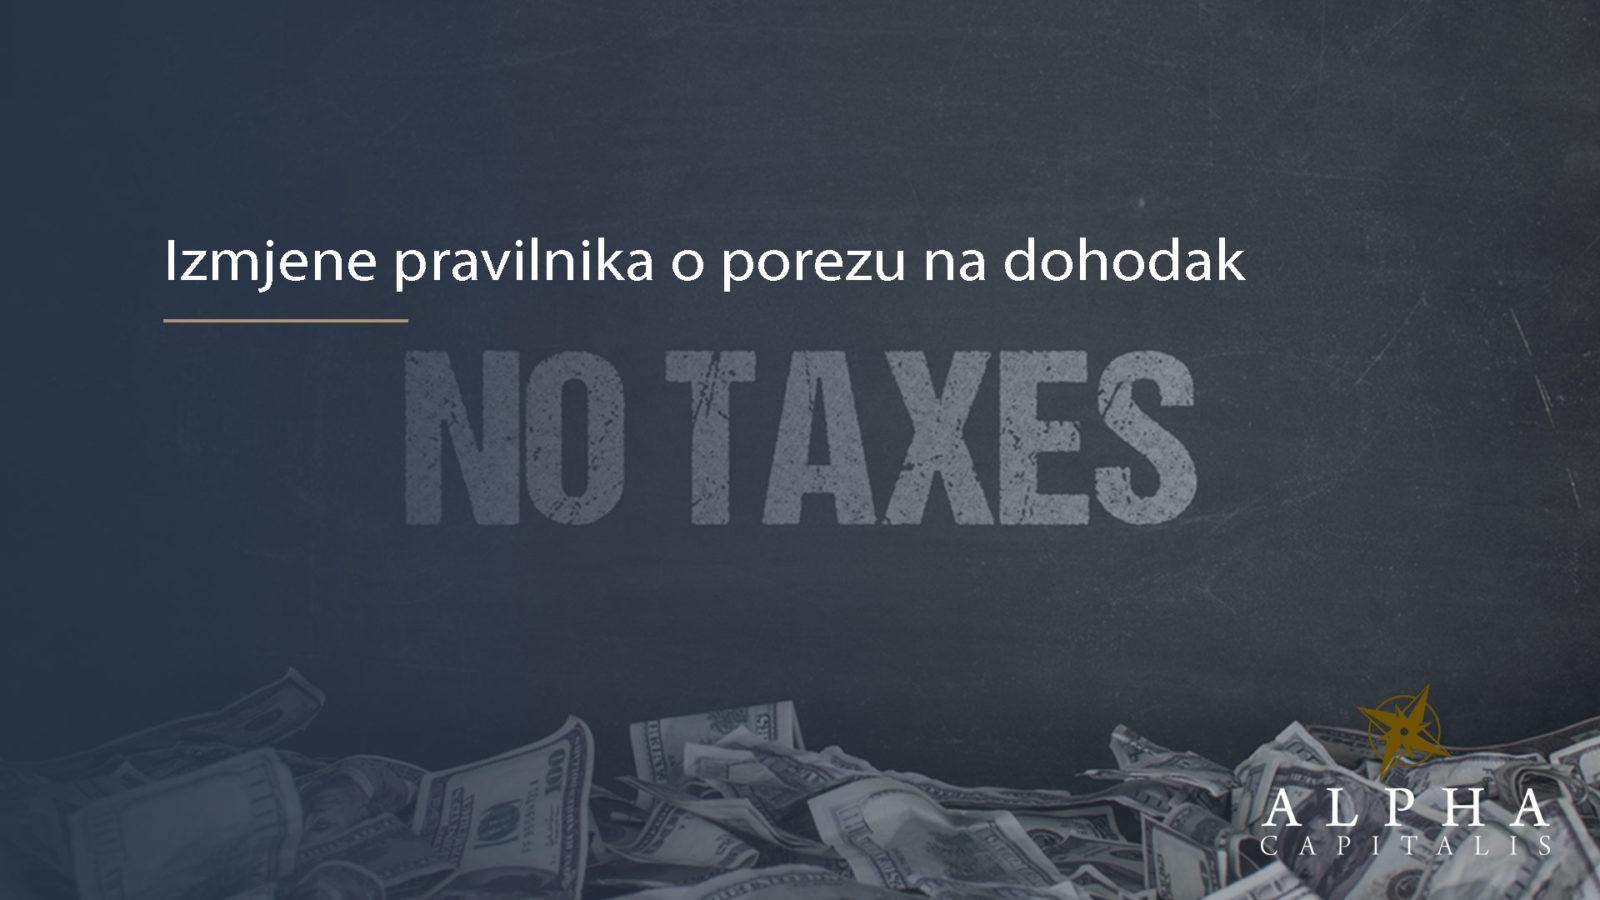 Izmjene pravilnika o porezu na dohodak - POREZI: Izmjene pravilnika o porezu na dohodak -> primjena 01.09.2019.